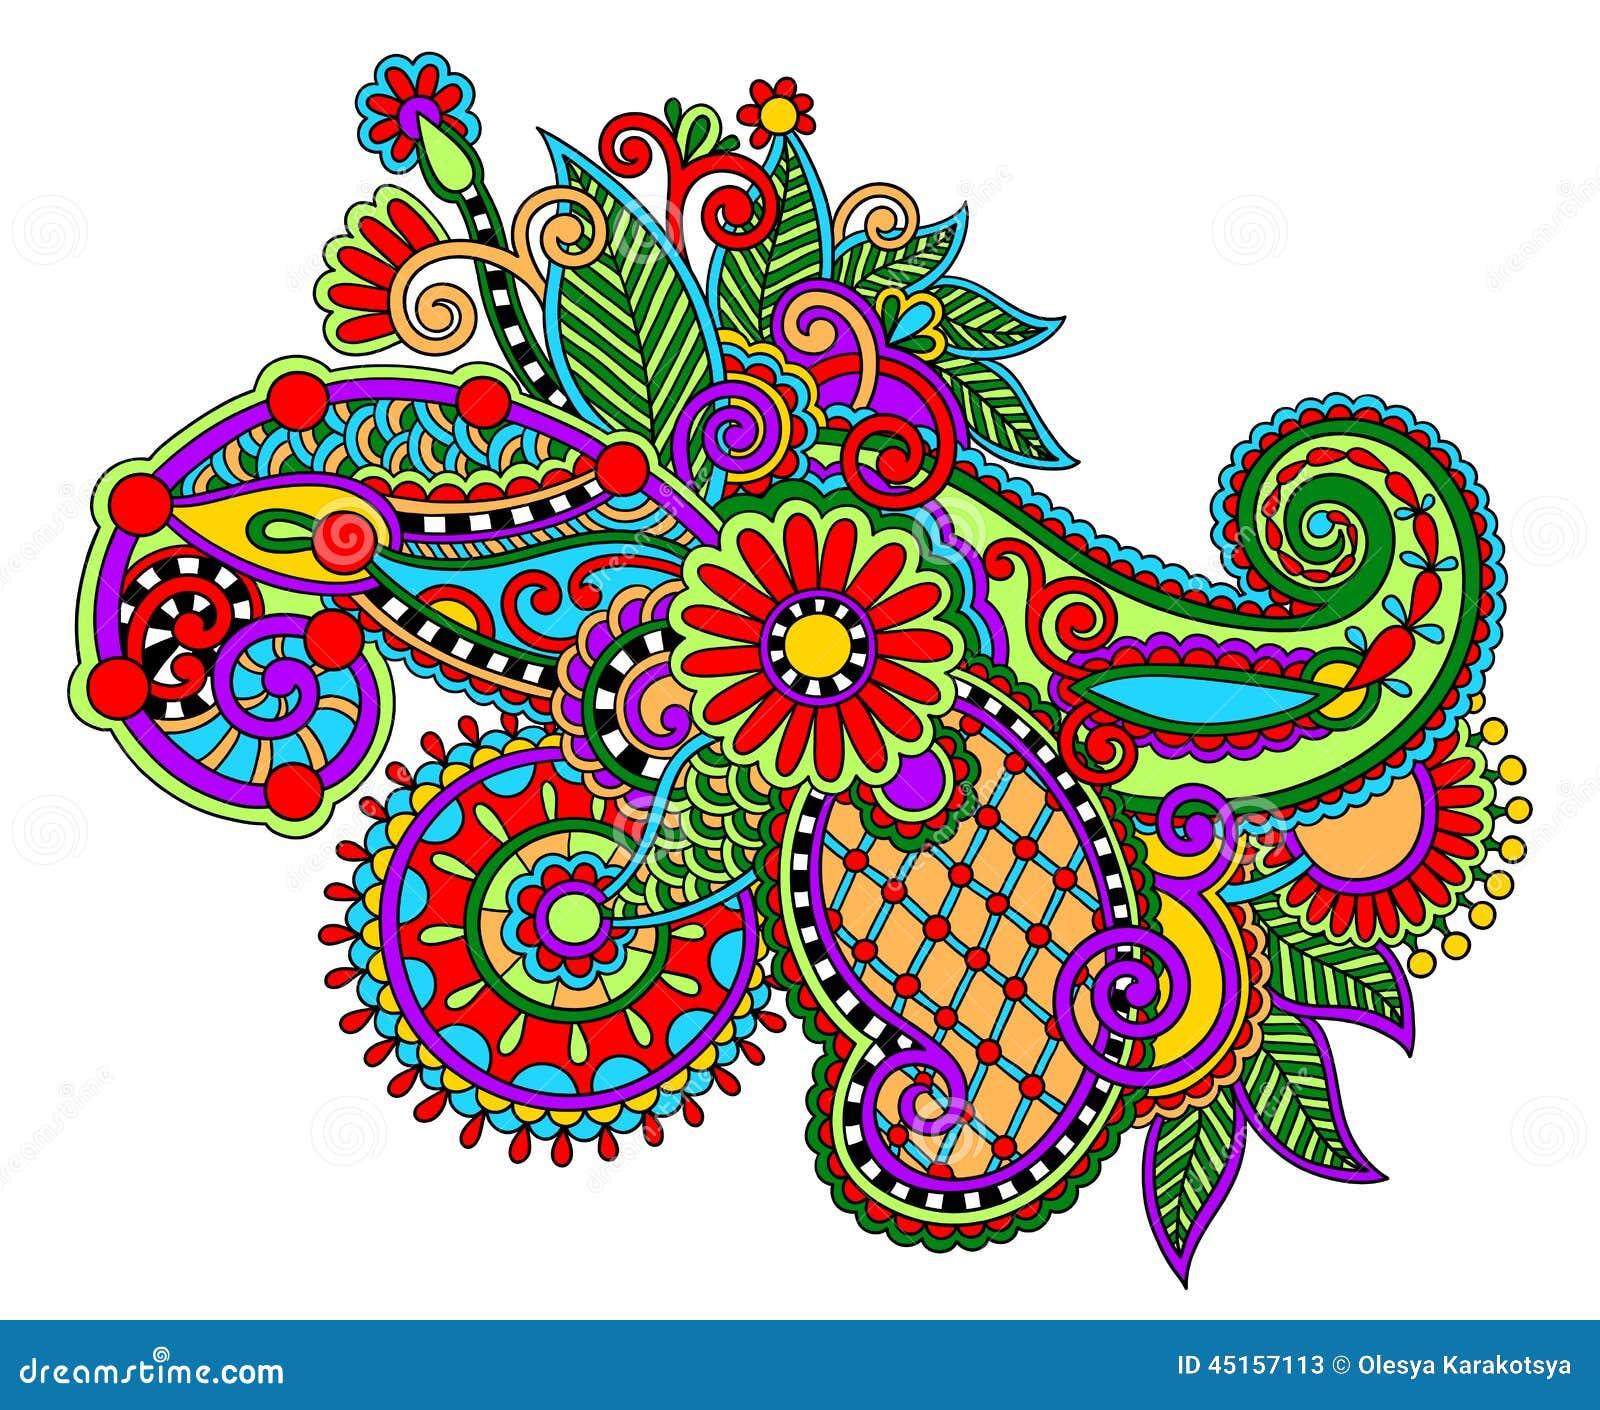 Original digital draw line art ornate flower